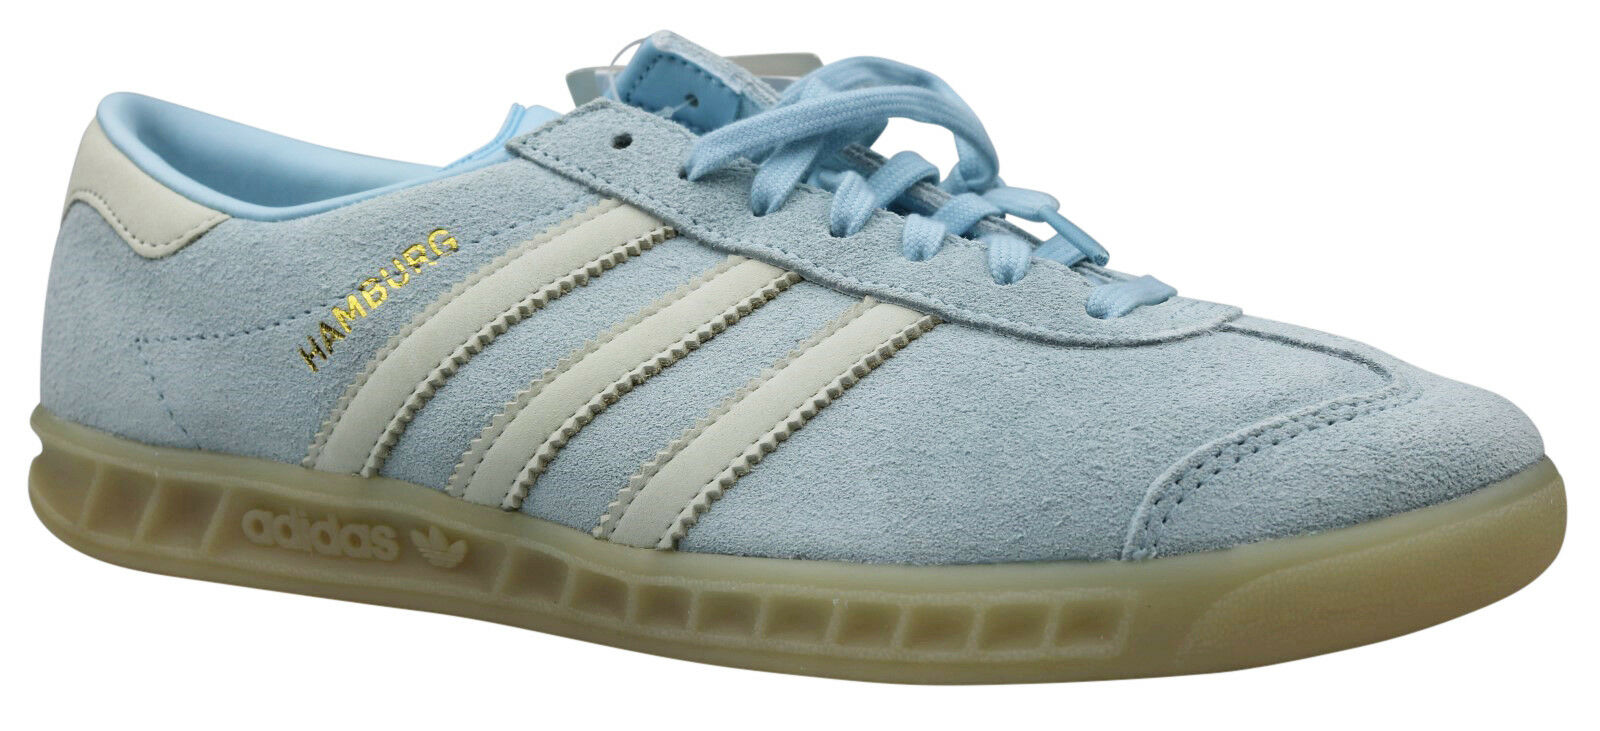 ADIDAS Originals Amburgo W scarpe da ginnastica Donna Scarpe Scarpe Scarpe Blu ba8410 Taglia 36,5 - 40 NUOVO OVP | Aspetto Gradevole  | Scolaro/Signora Scarpa  d43570